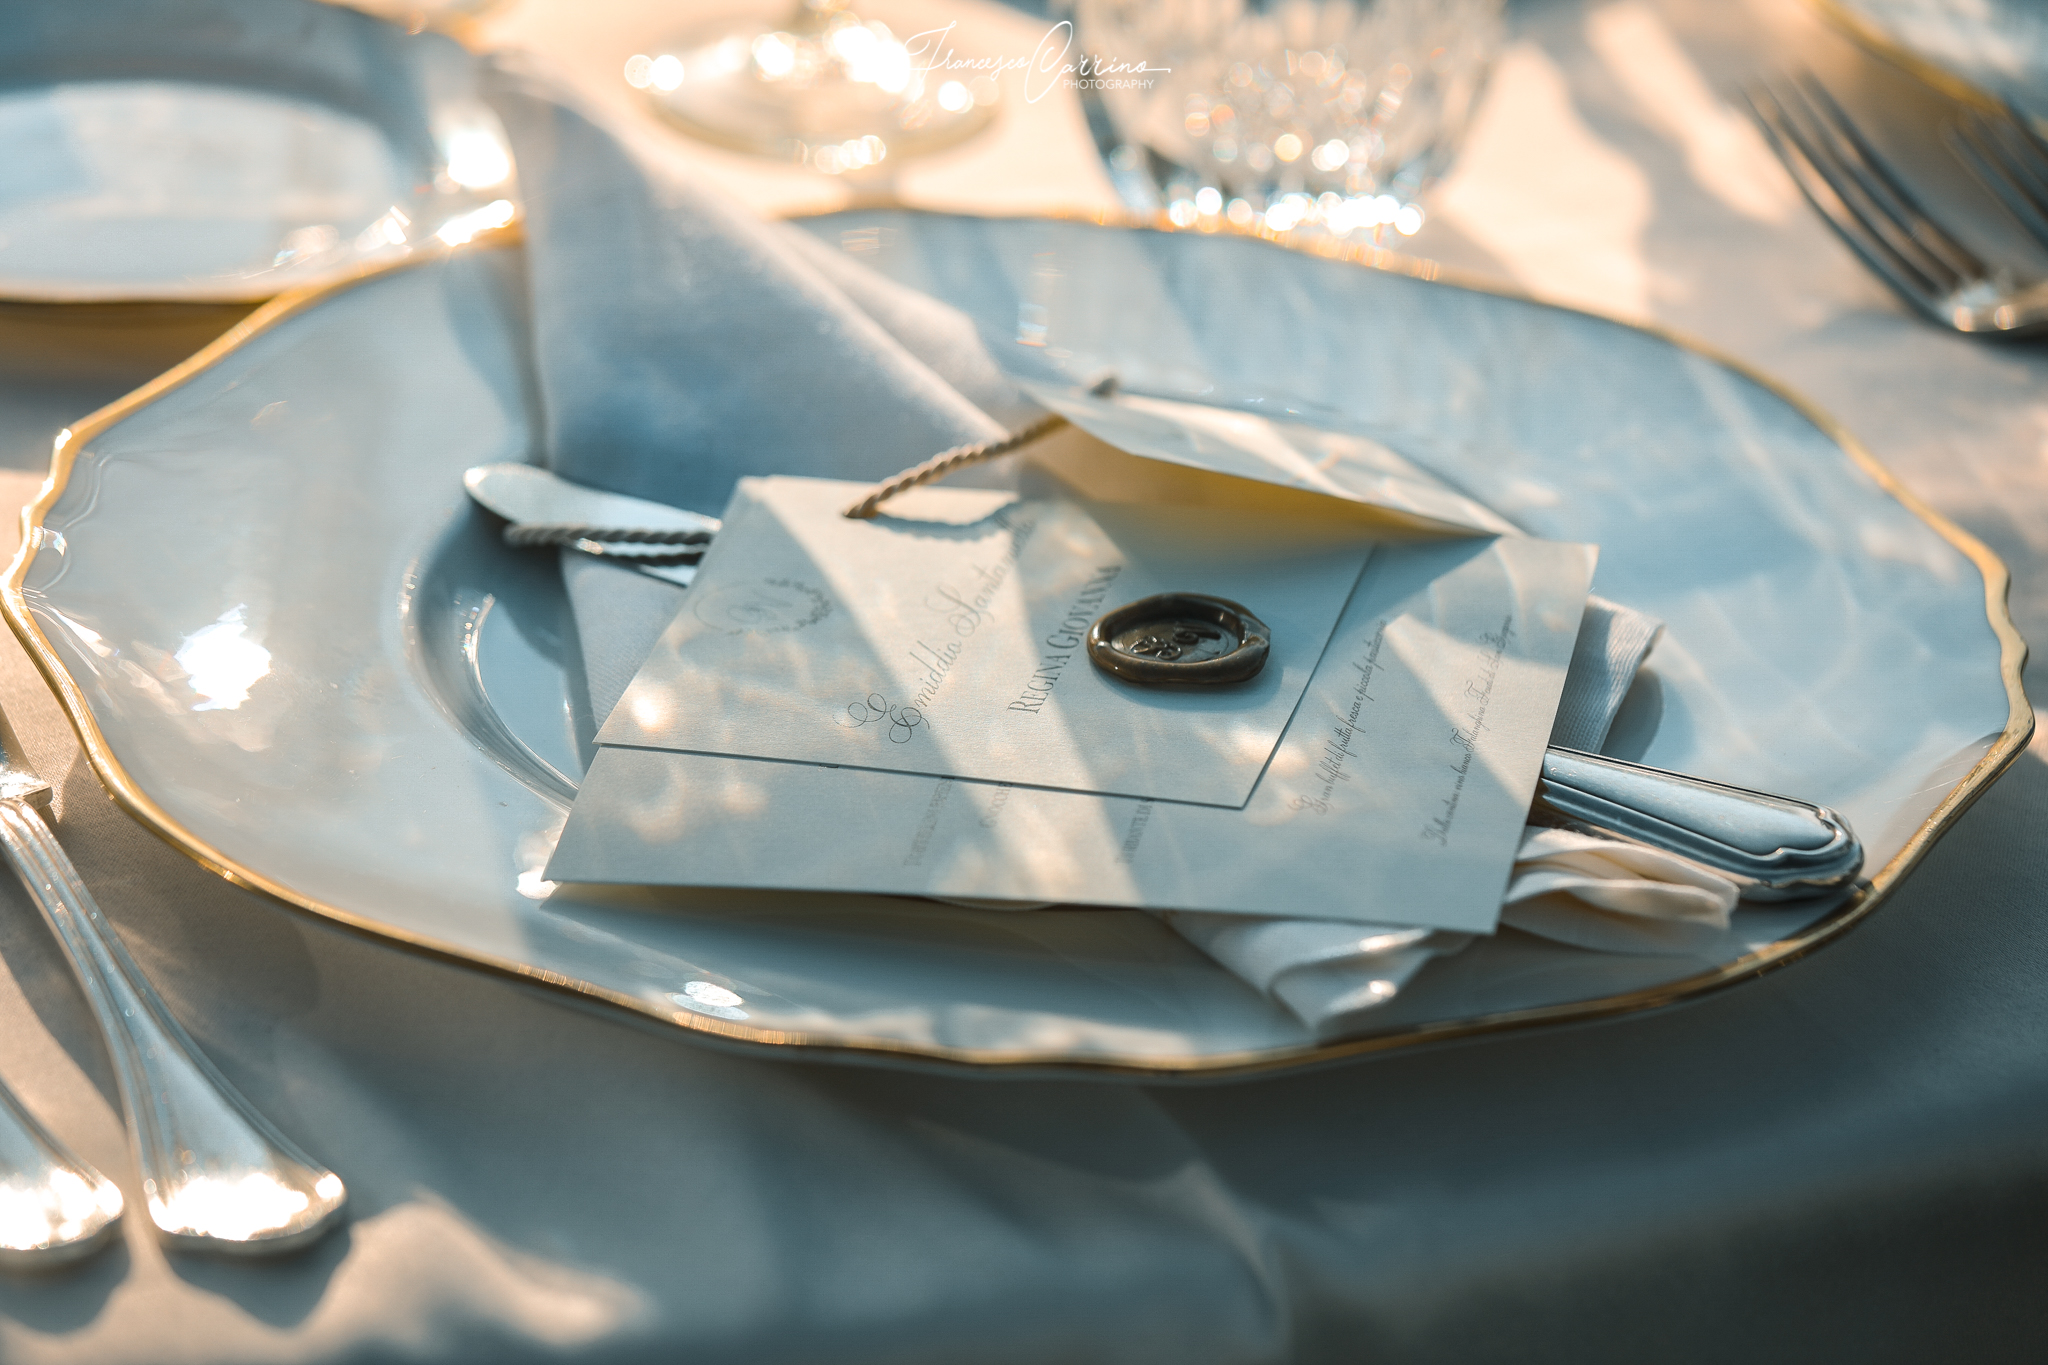 https://www.weddingamalfi.com/wp-content/uploads/Giannenza-13-luglio-2019-12.jpg